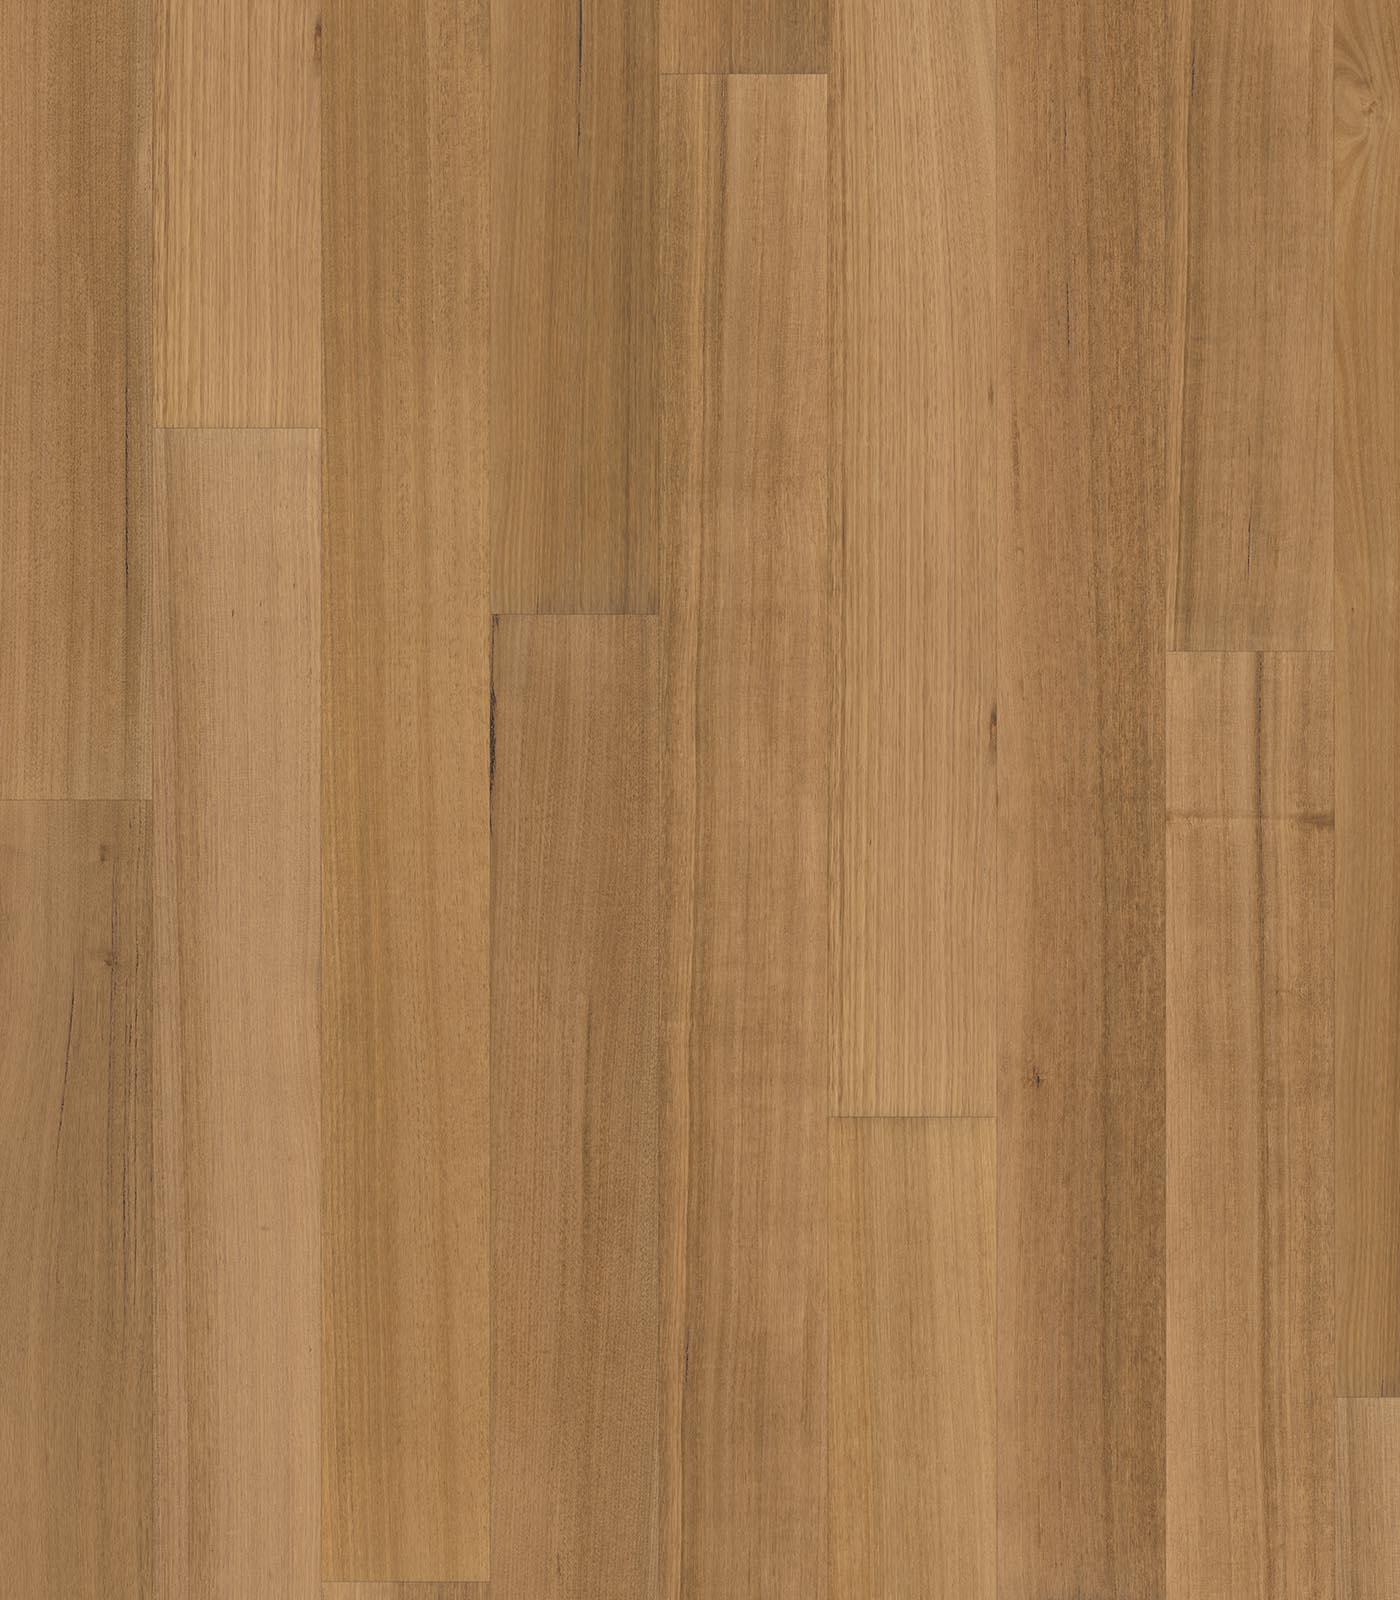 New Castle-After Oak Collection-Tasmanian Oak Floors-flat